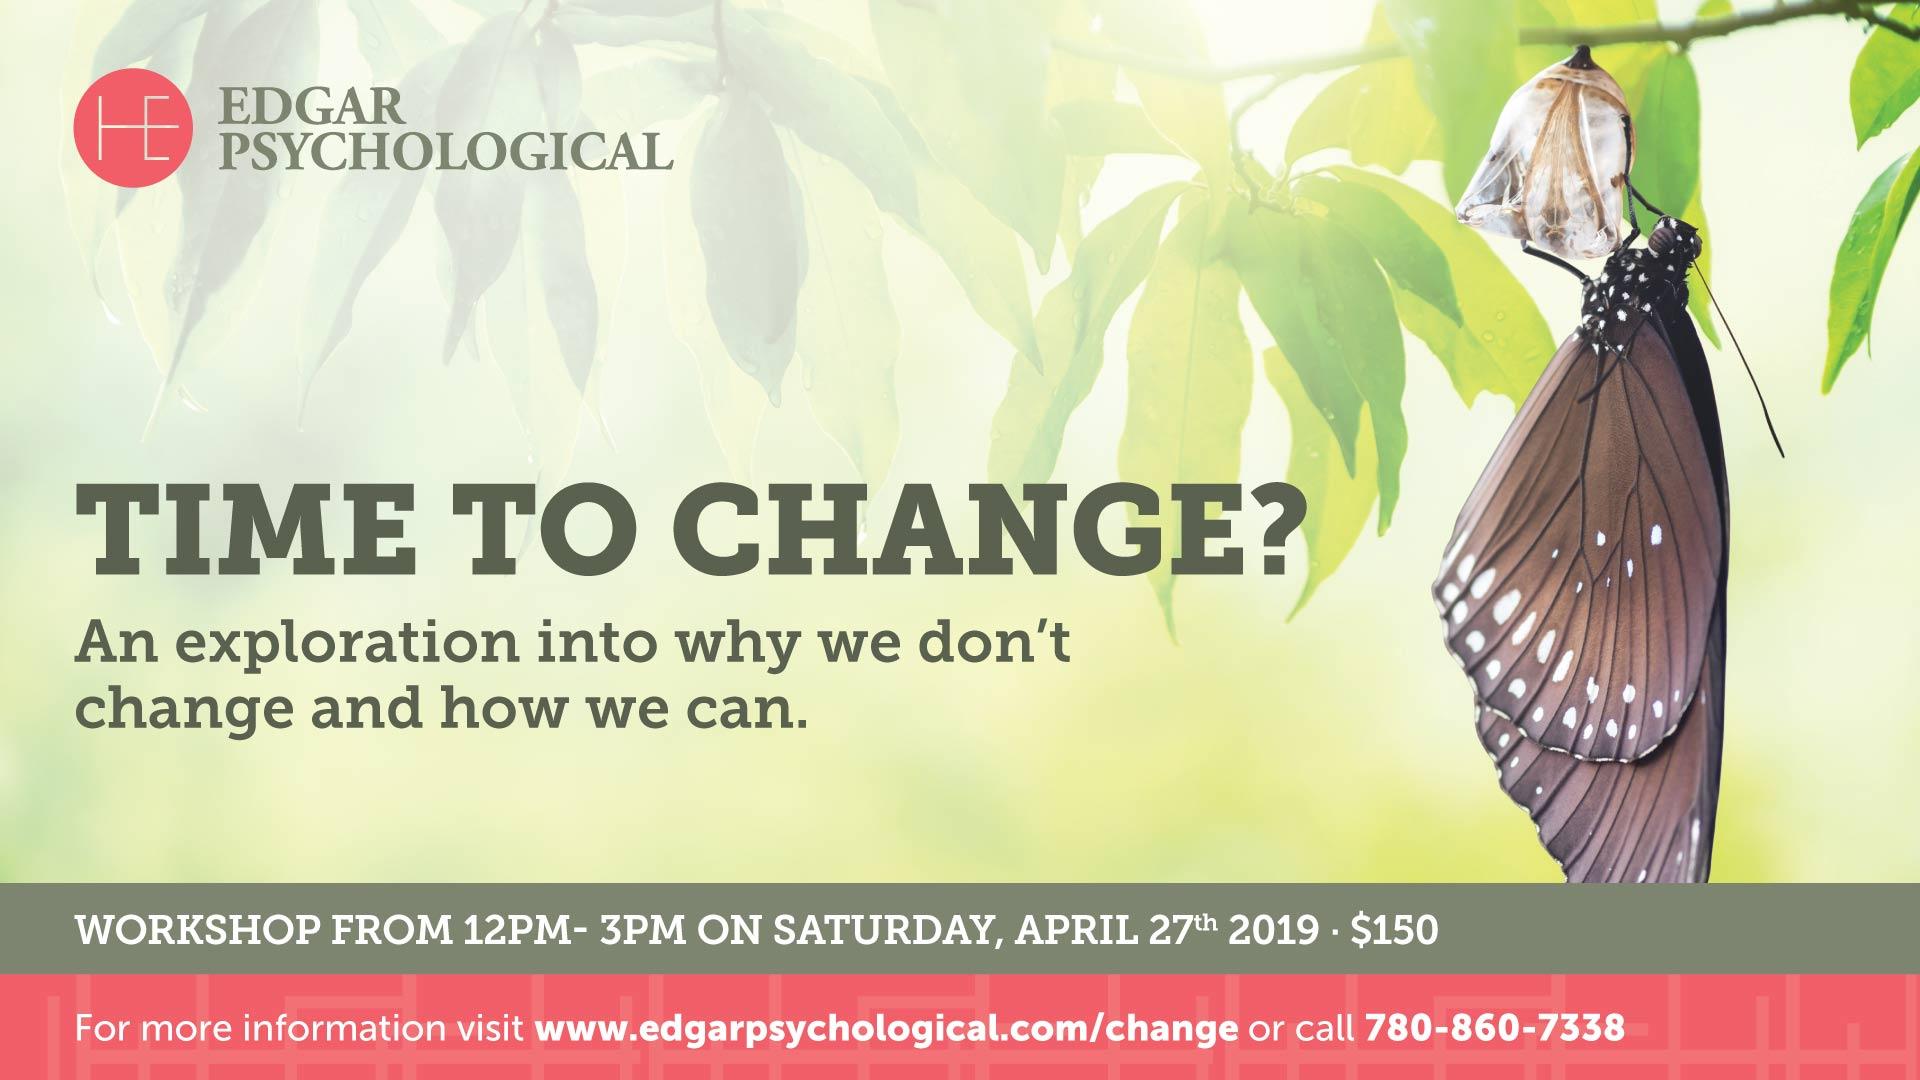 EP_time-to-change_social_20190221.jpg